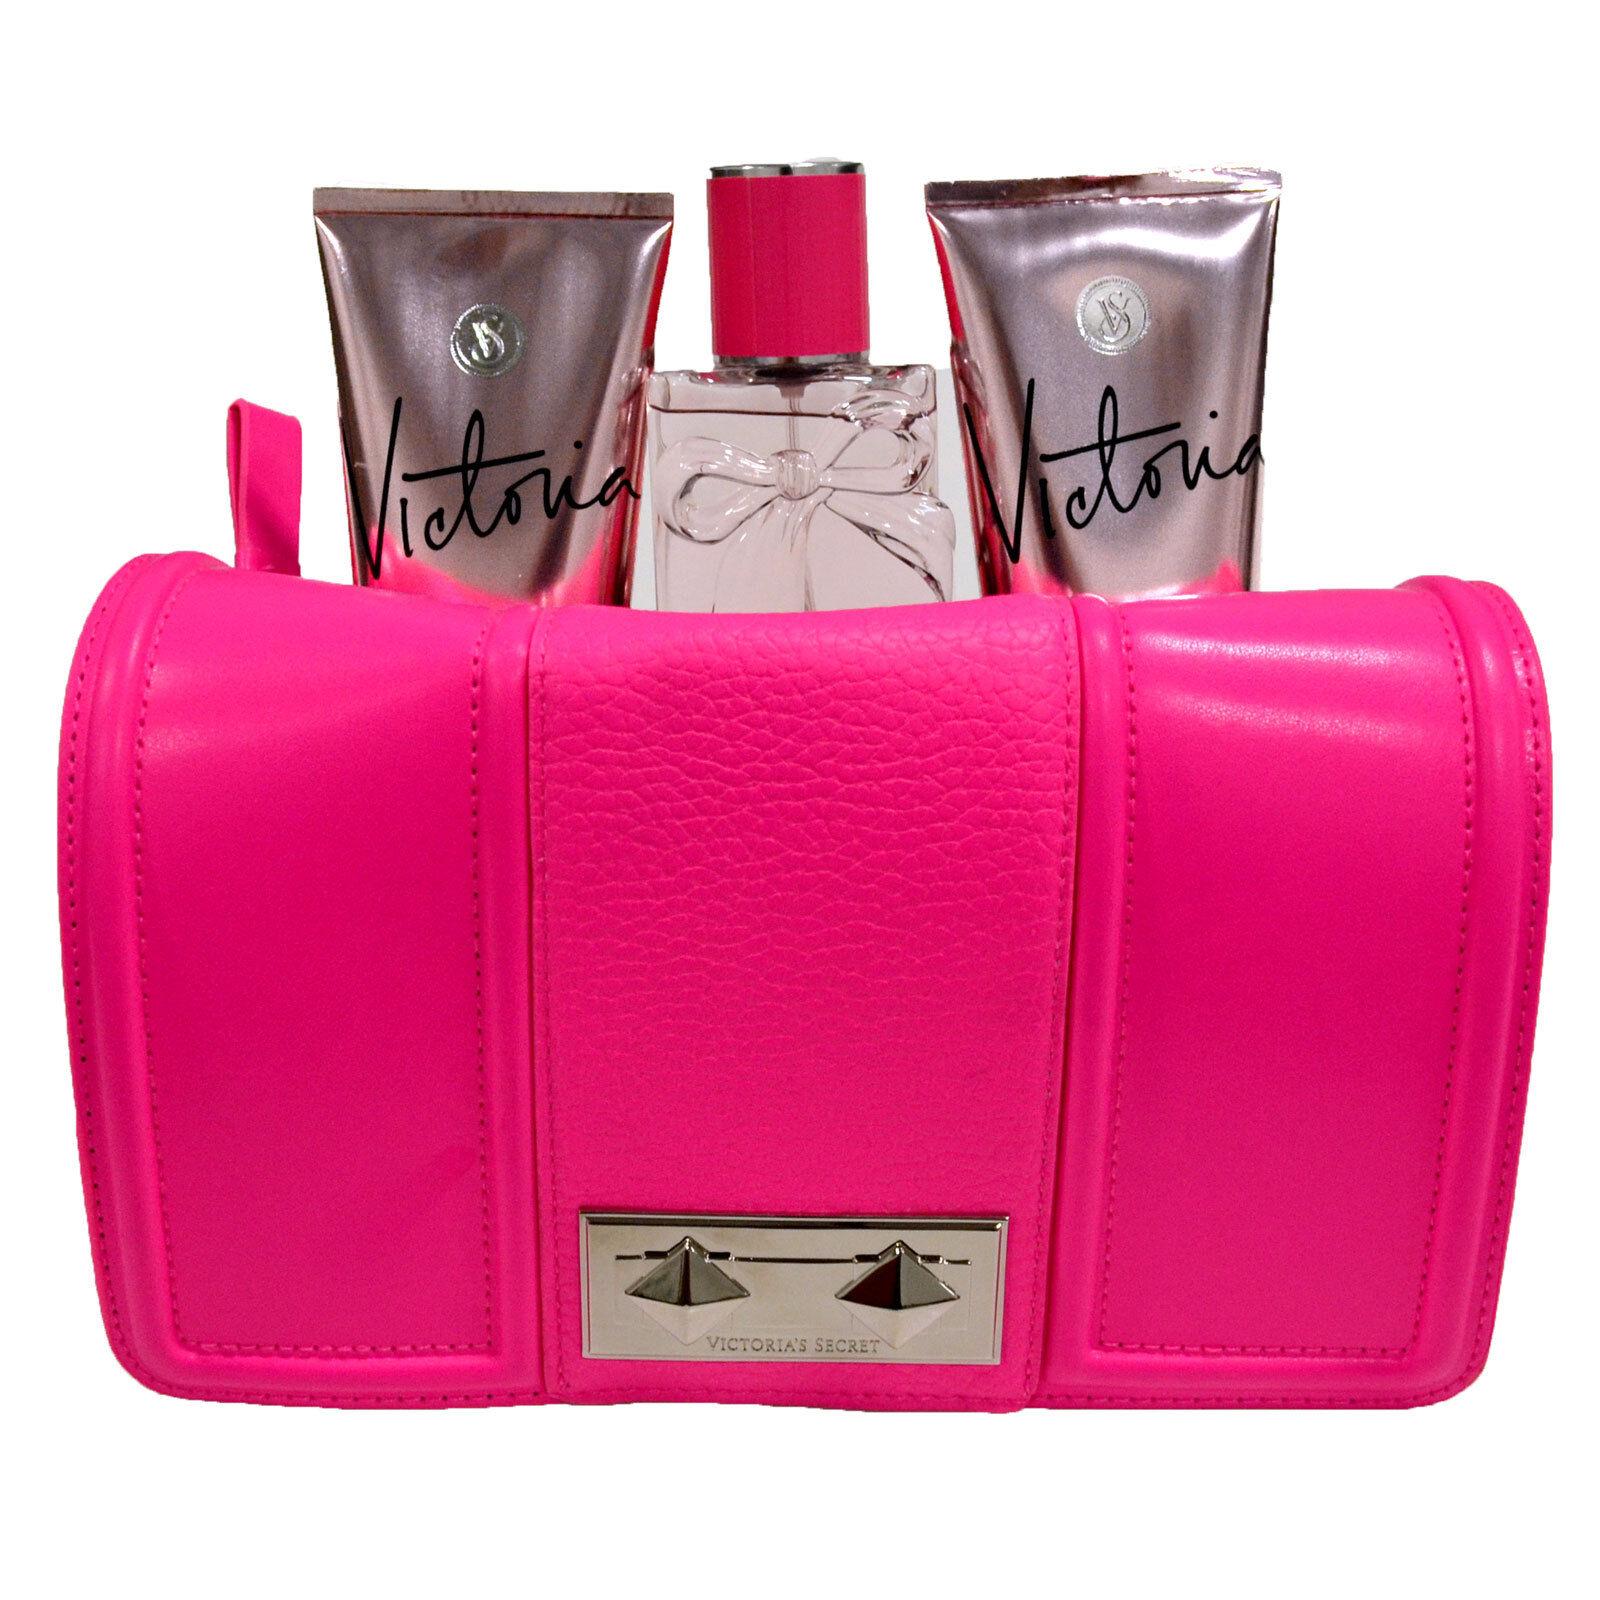 Victoria's Secret Gift Set 3 Piece Mist Lotion Body Wash ...